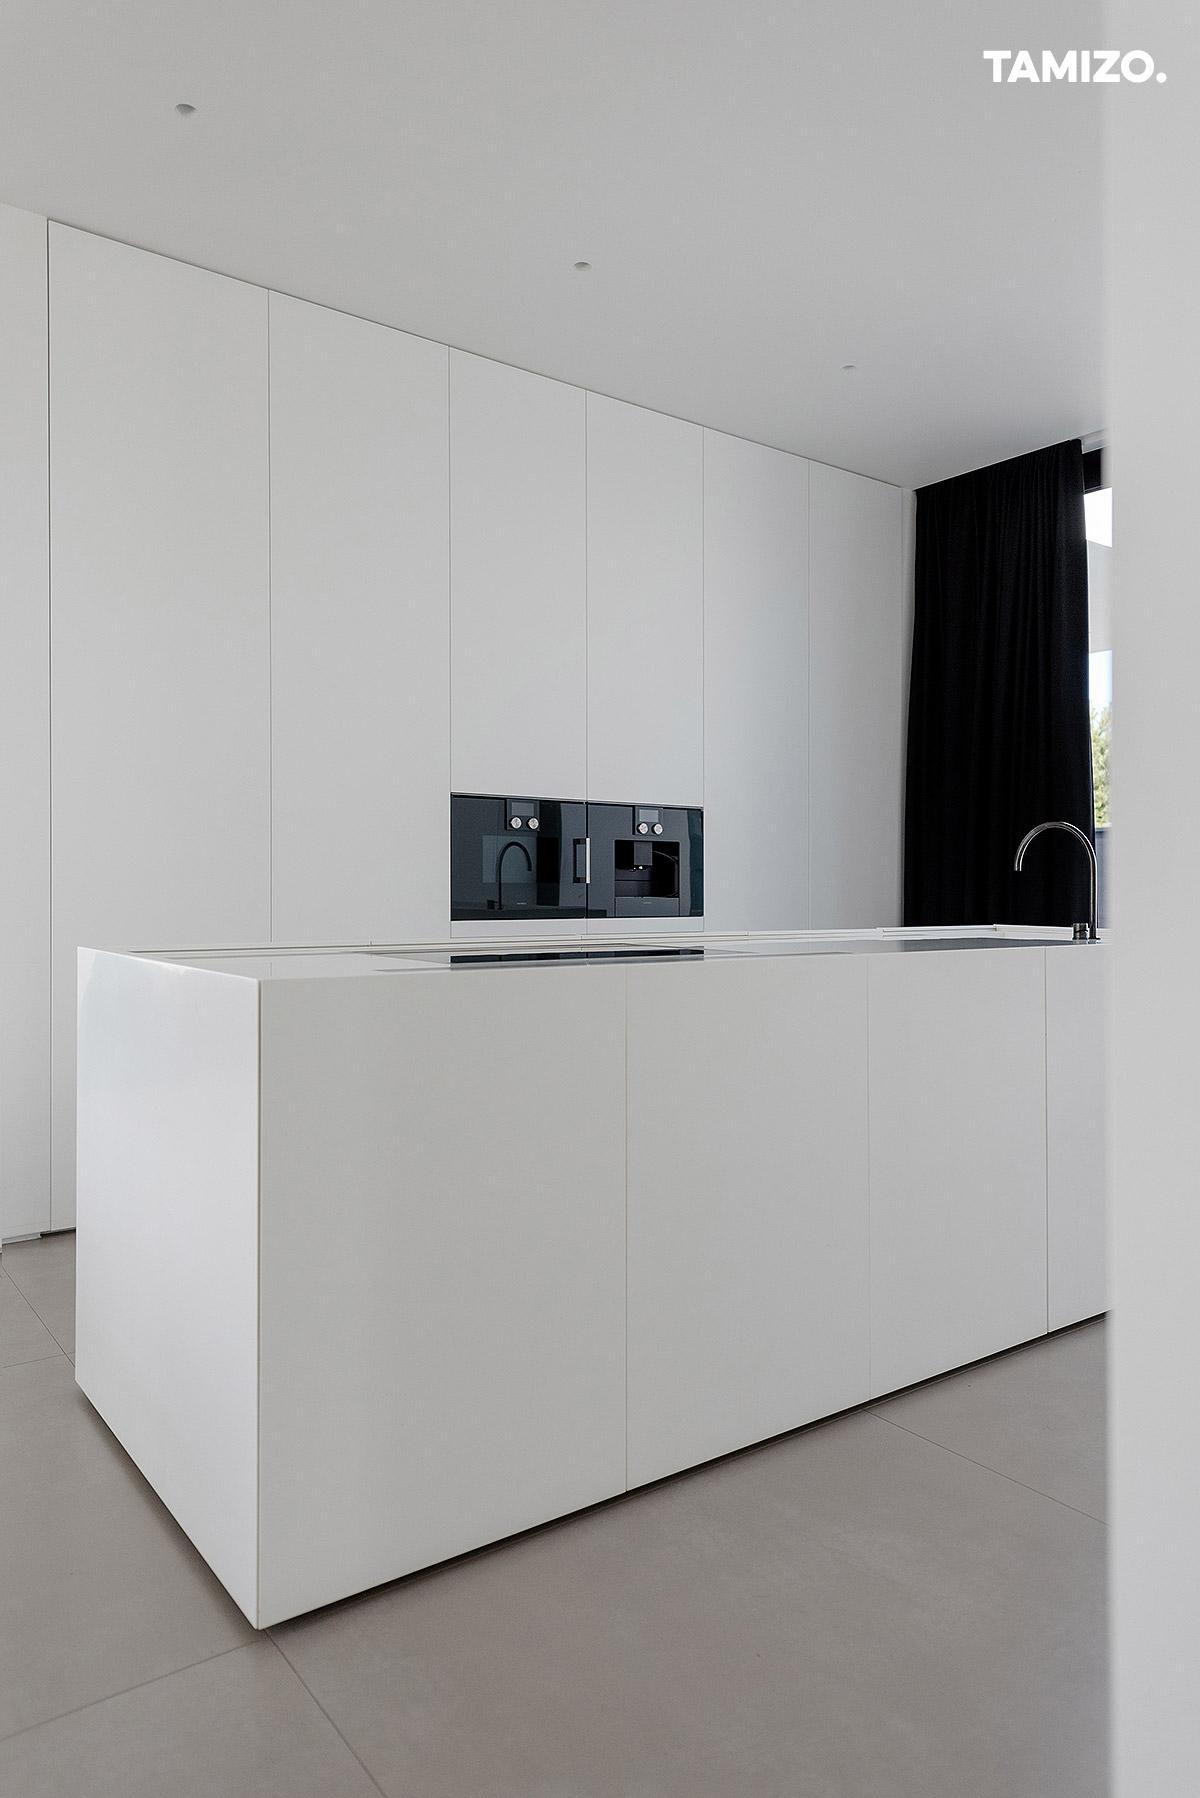 020_tamizo_architects_interior_house_realization_warsaw_poland_29